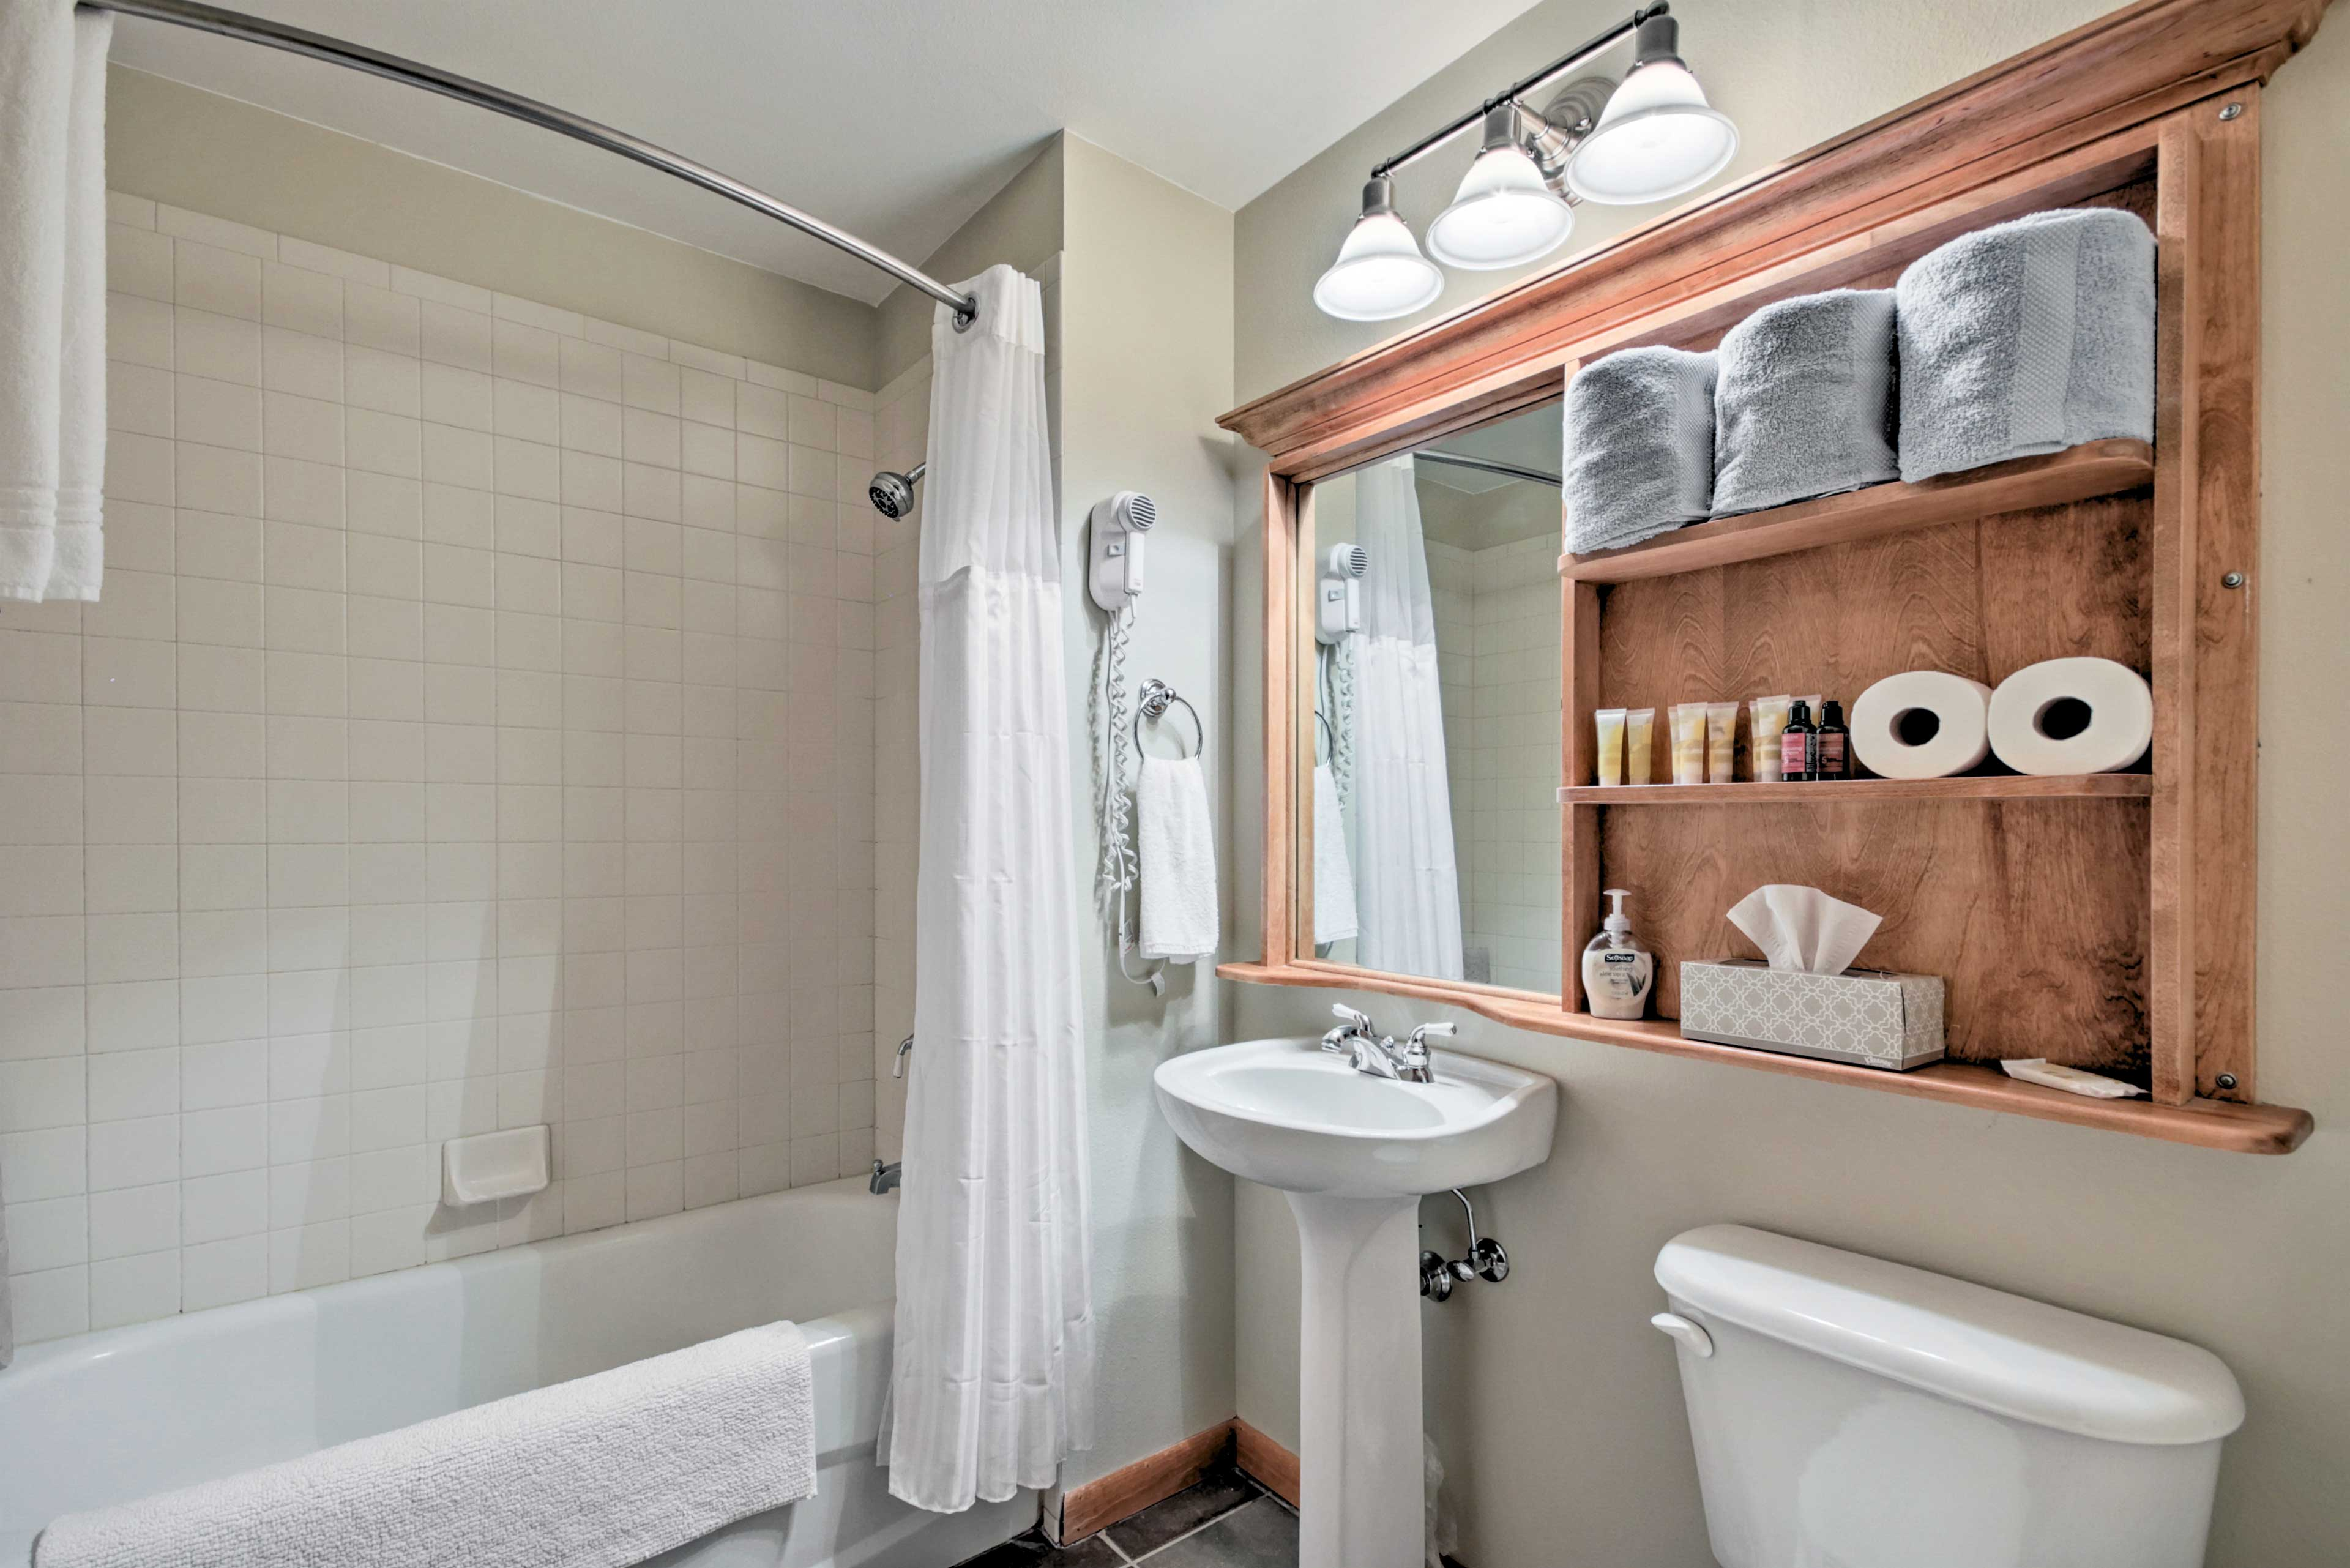 Bathroom | Hair Dryer | Towels Provided